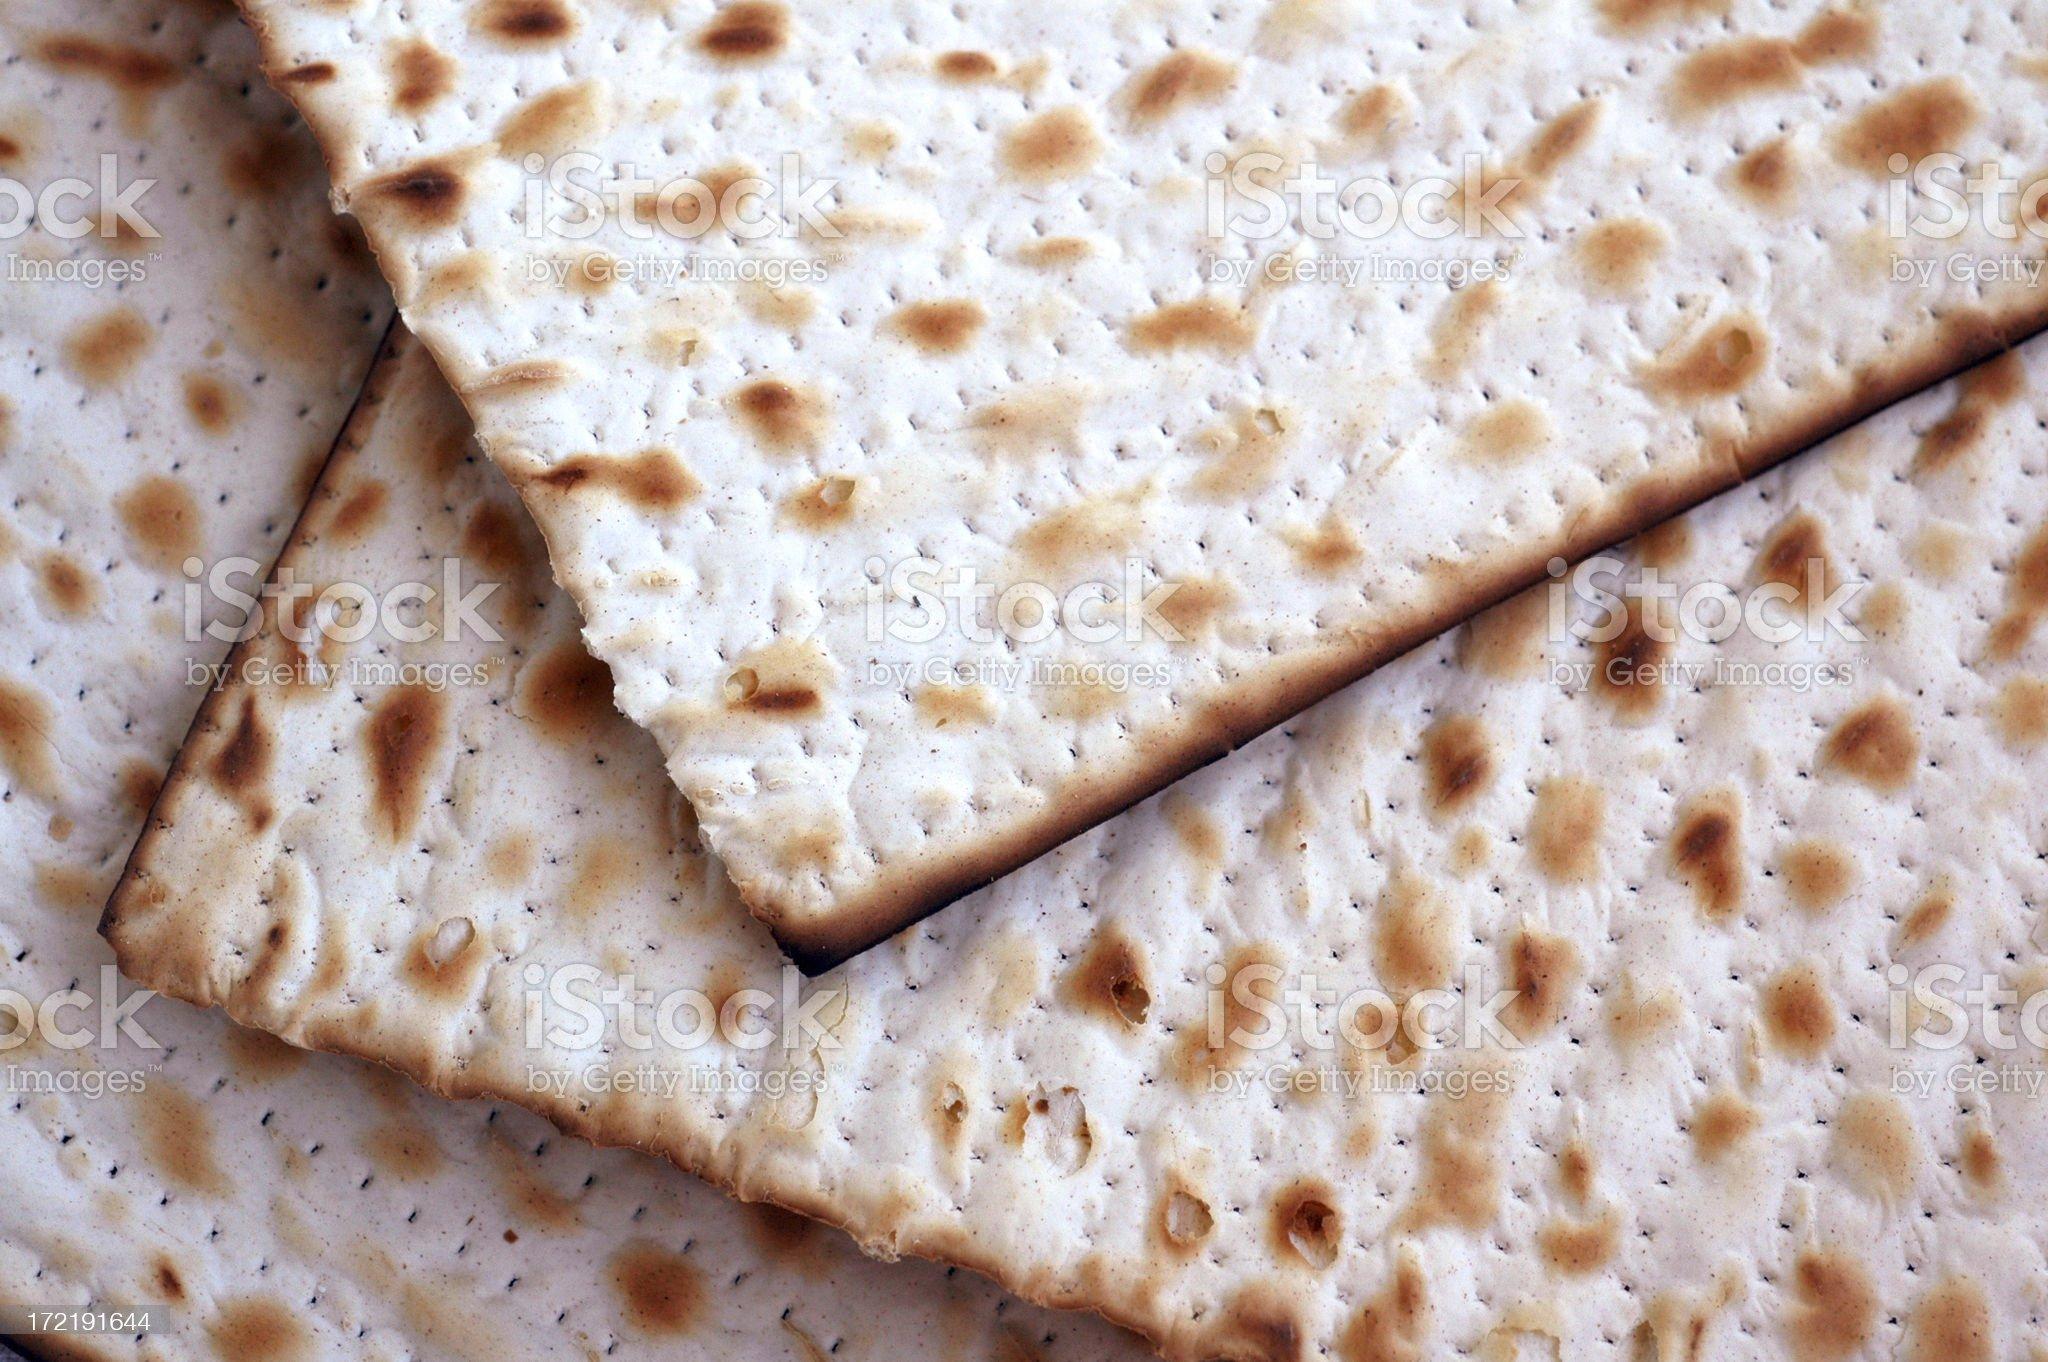 Passover Matzos royalty-free stock photo